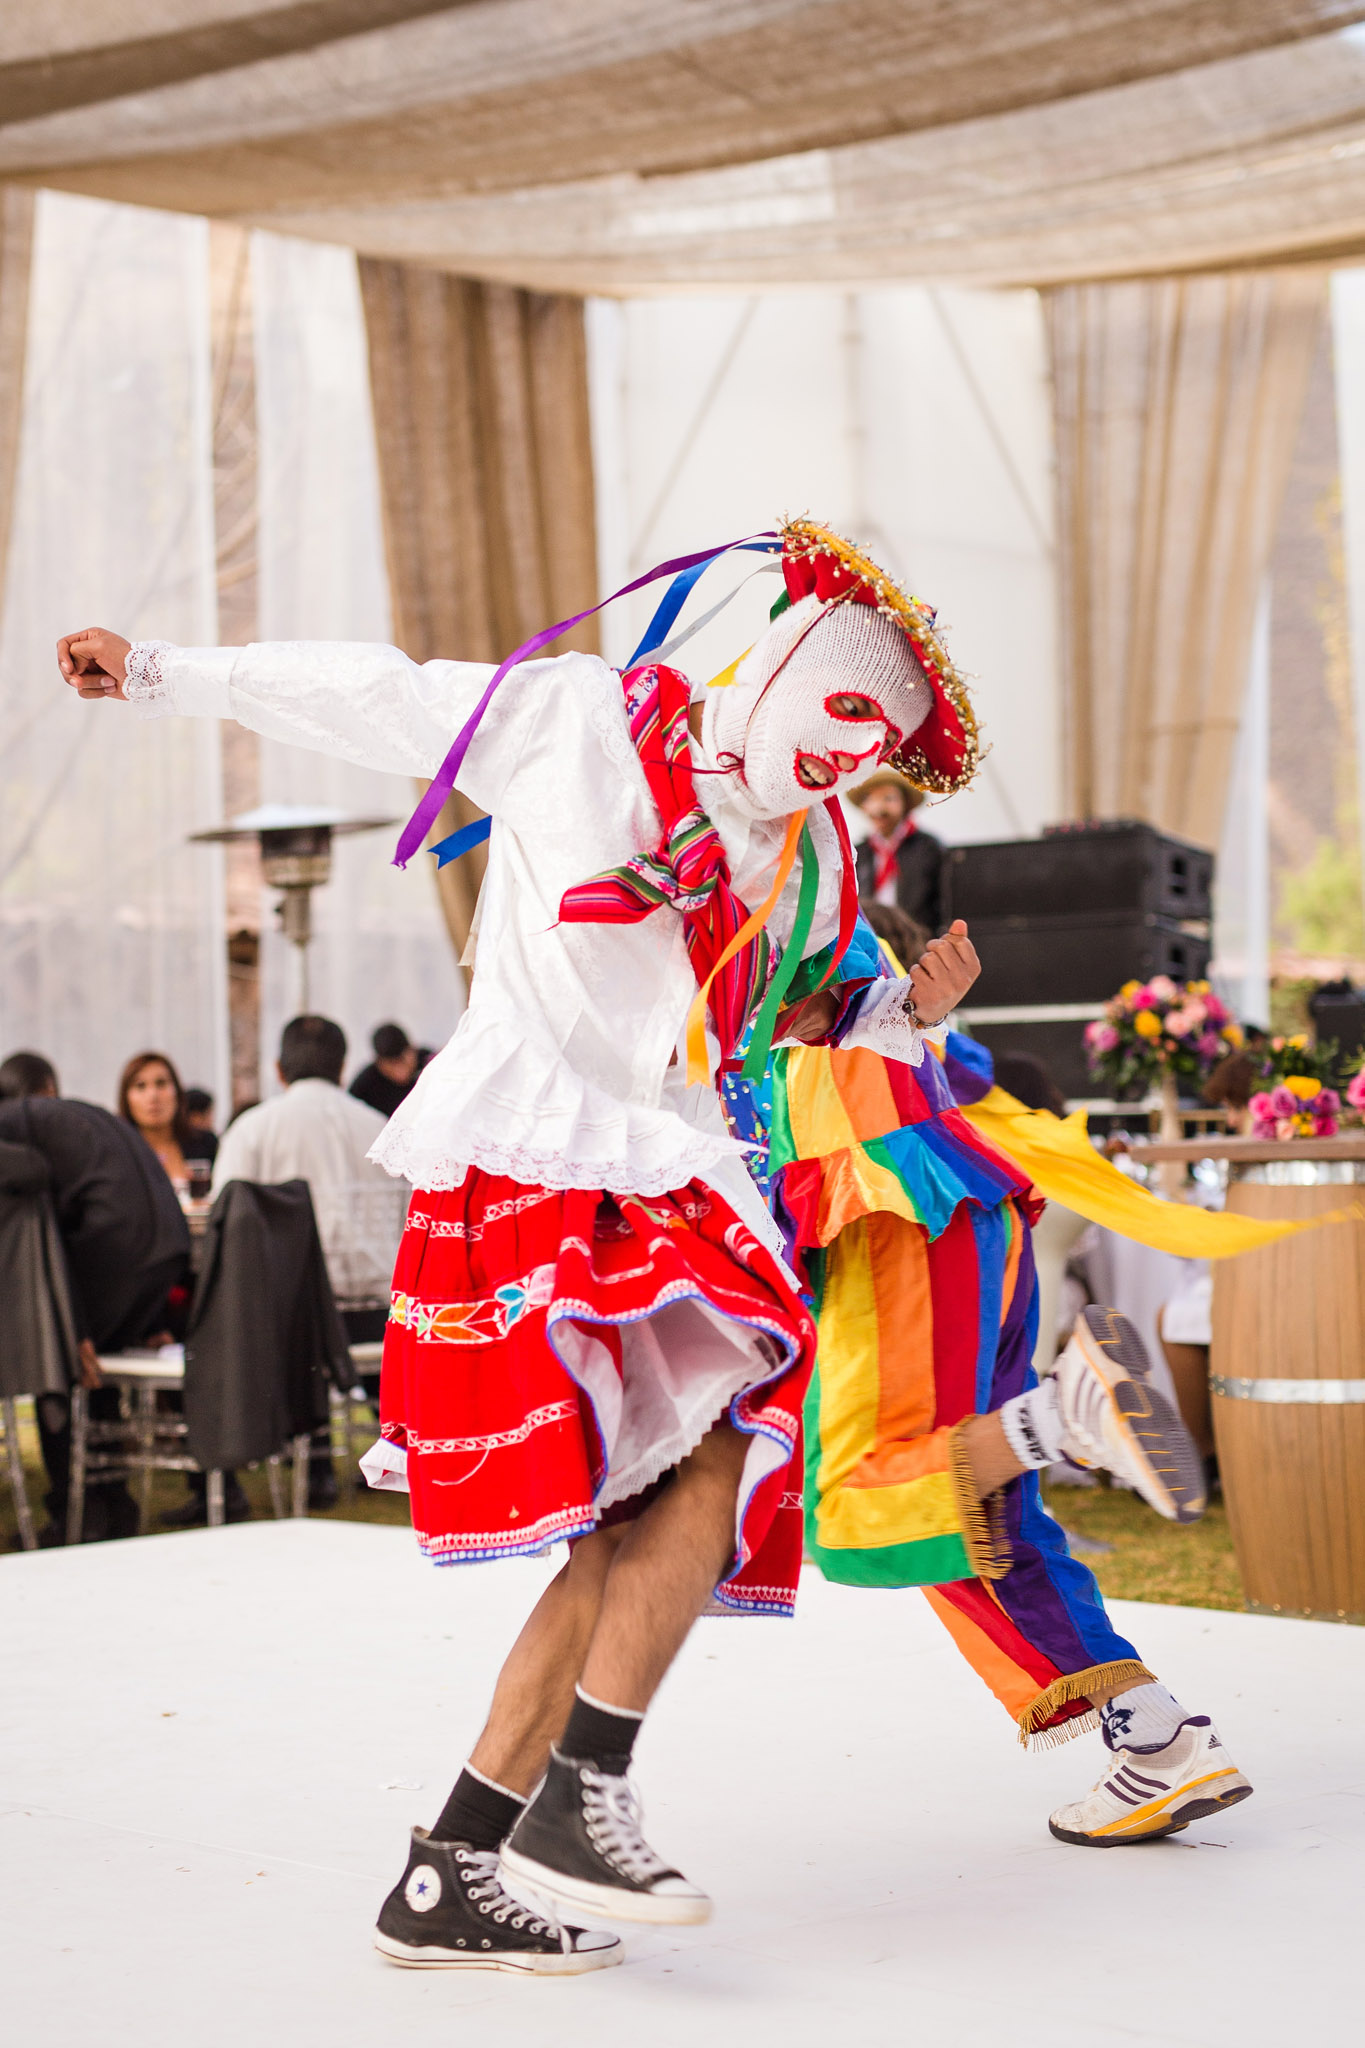 Wedding-Travellers-Destination-Wedding-Peru-Cusco-Hacienda-Sarapampa-Sacred-Valley-traditional-costume-entertainment